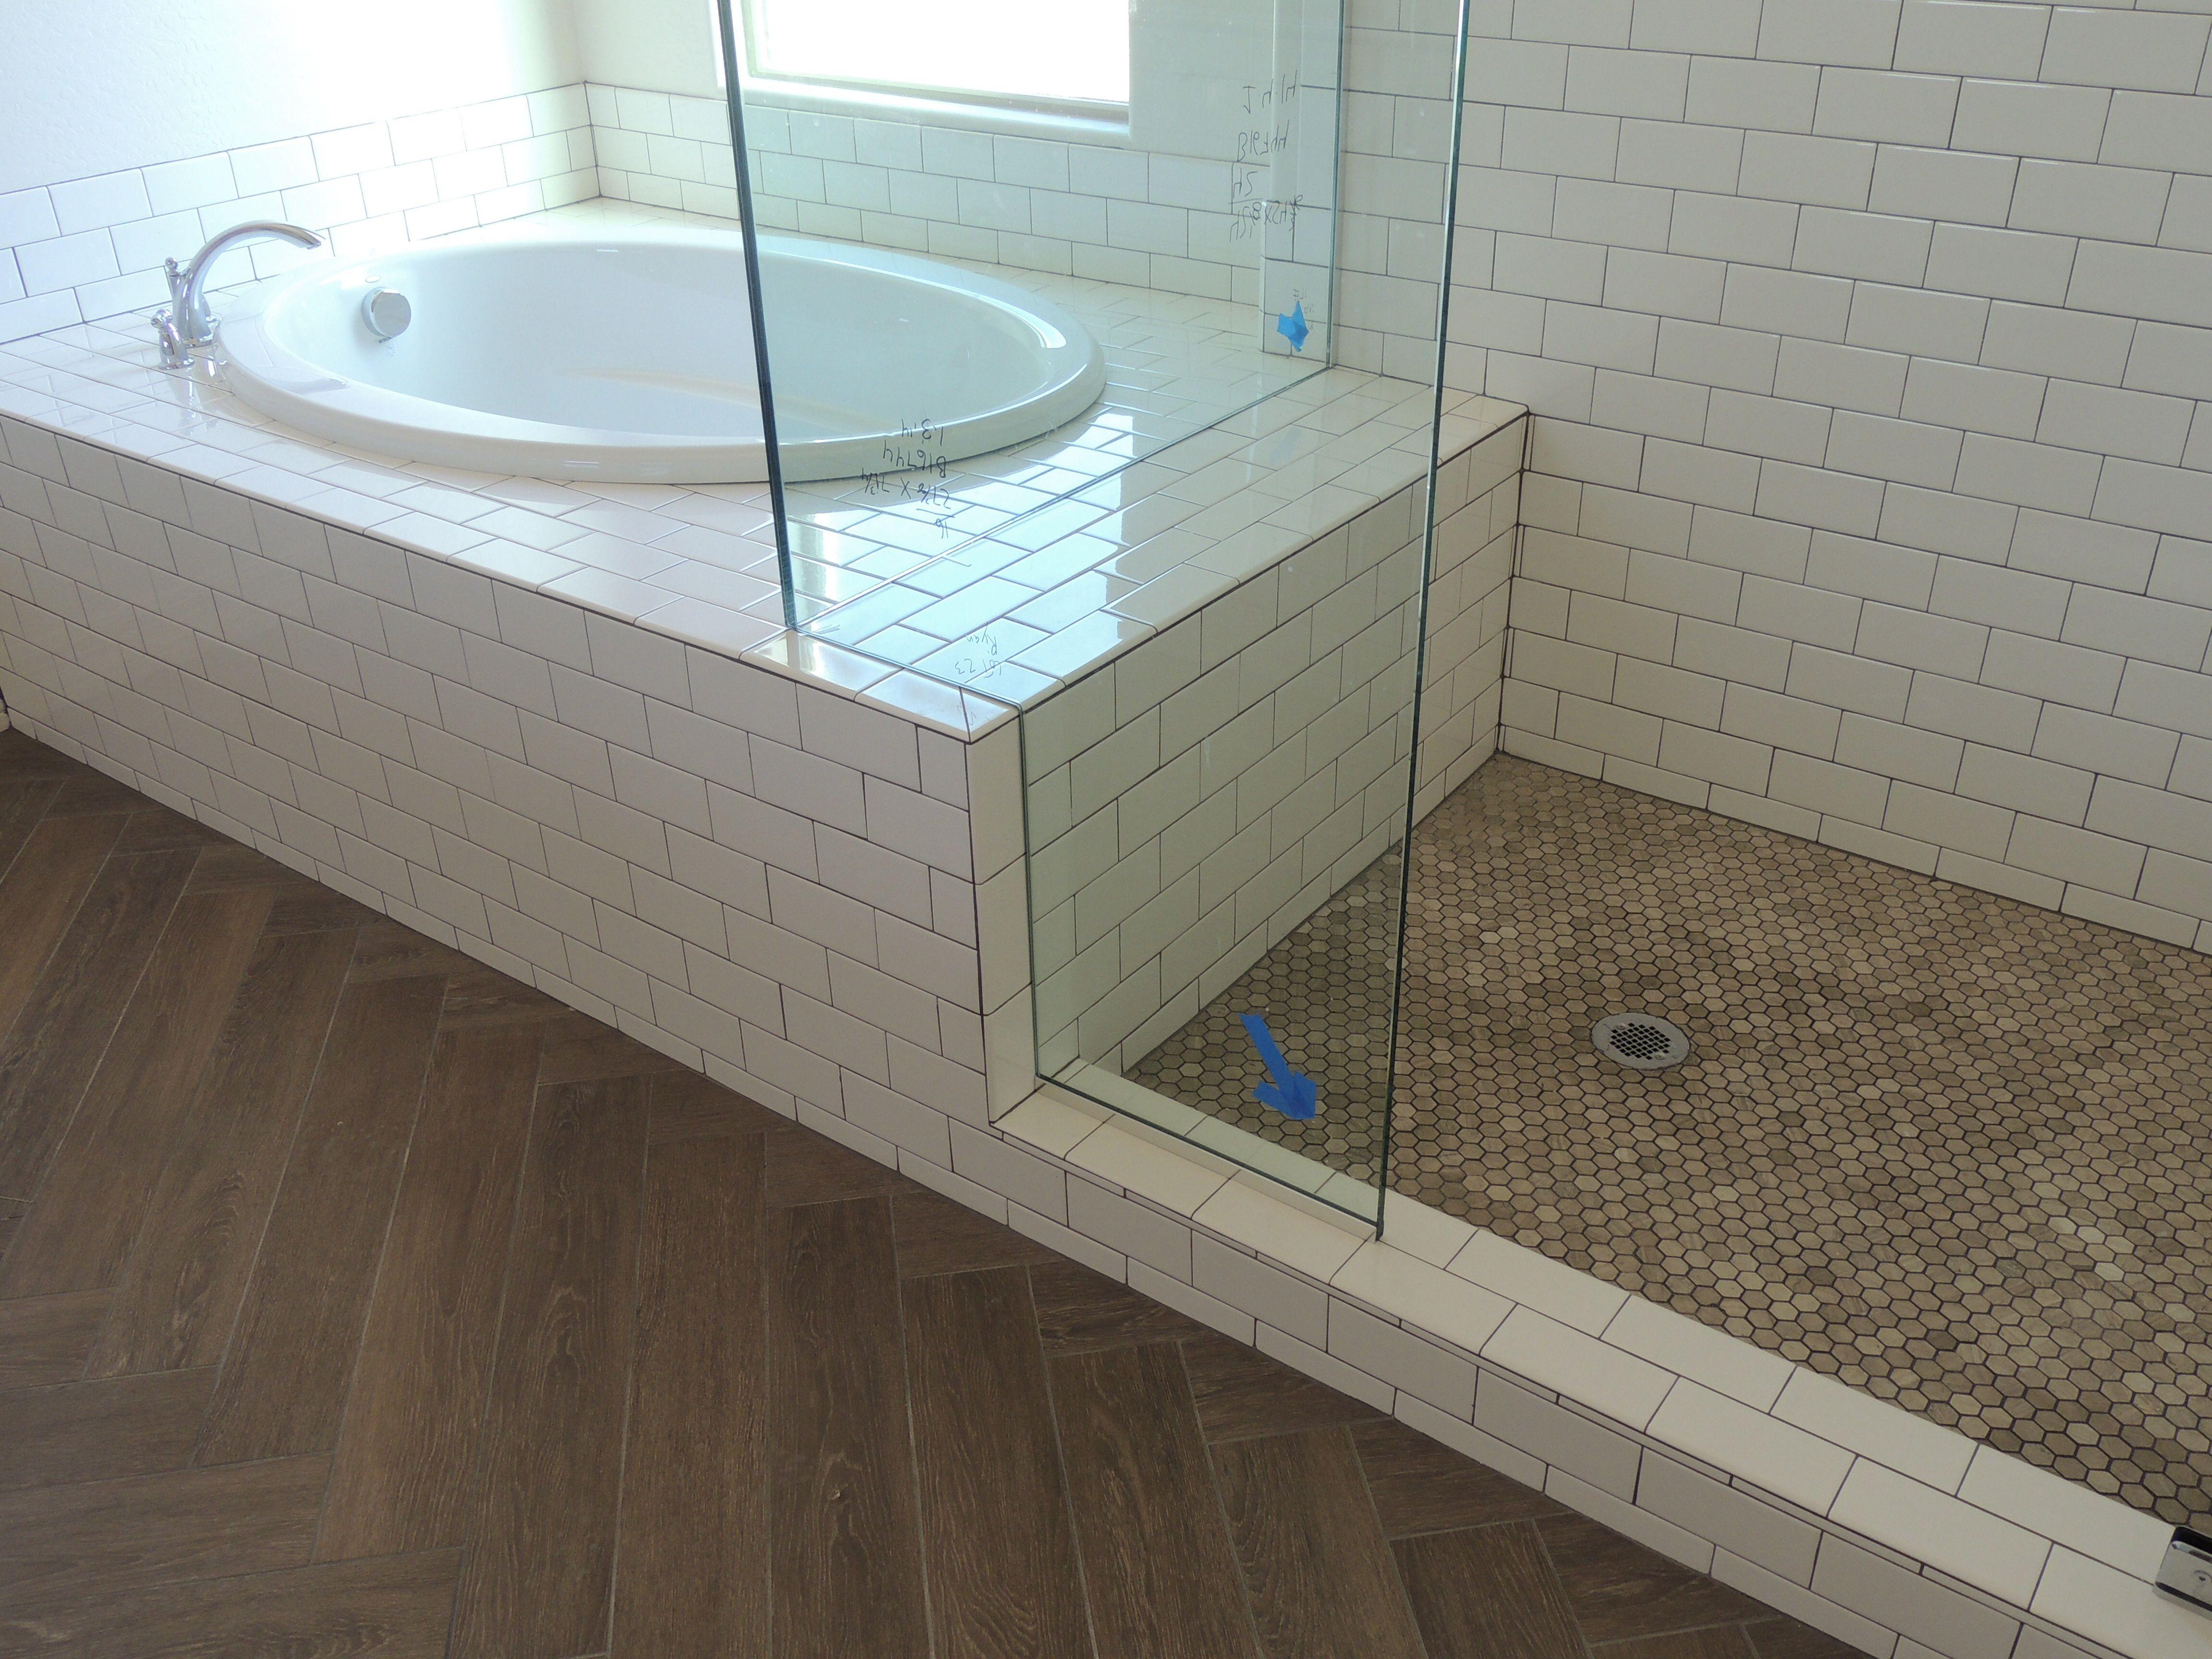 Chevron herringbone faux wood floor tile brown gray white for Wood tile tub surround